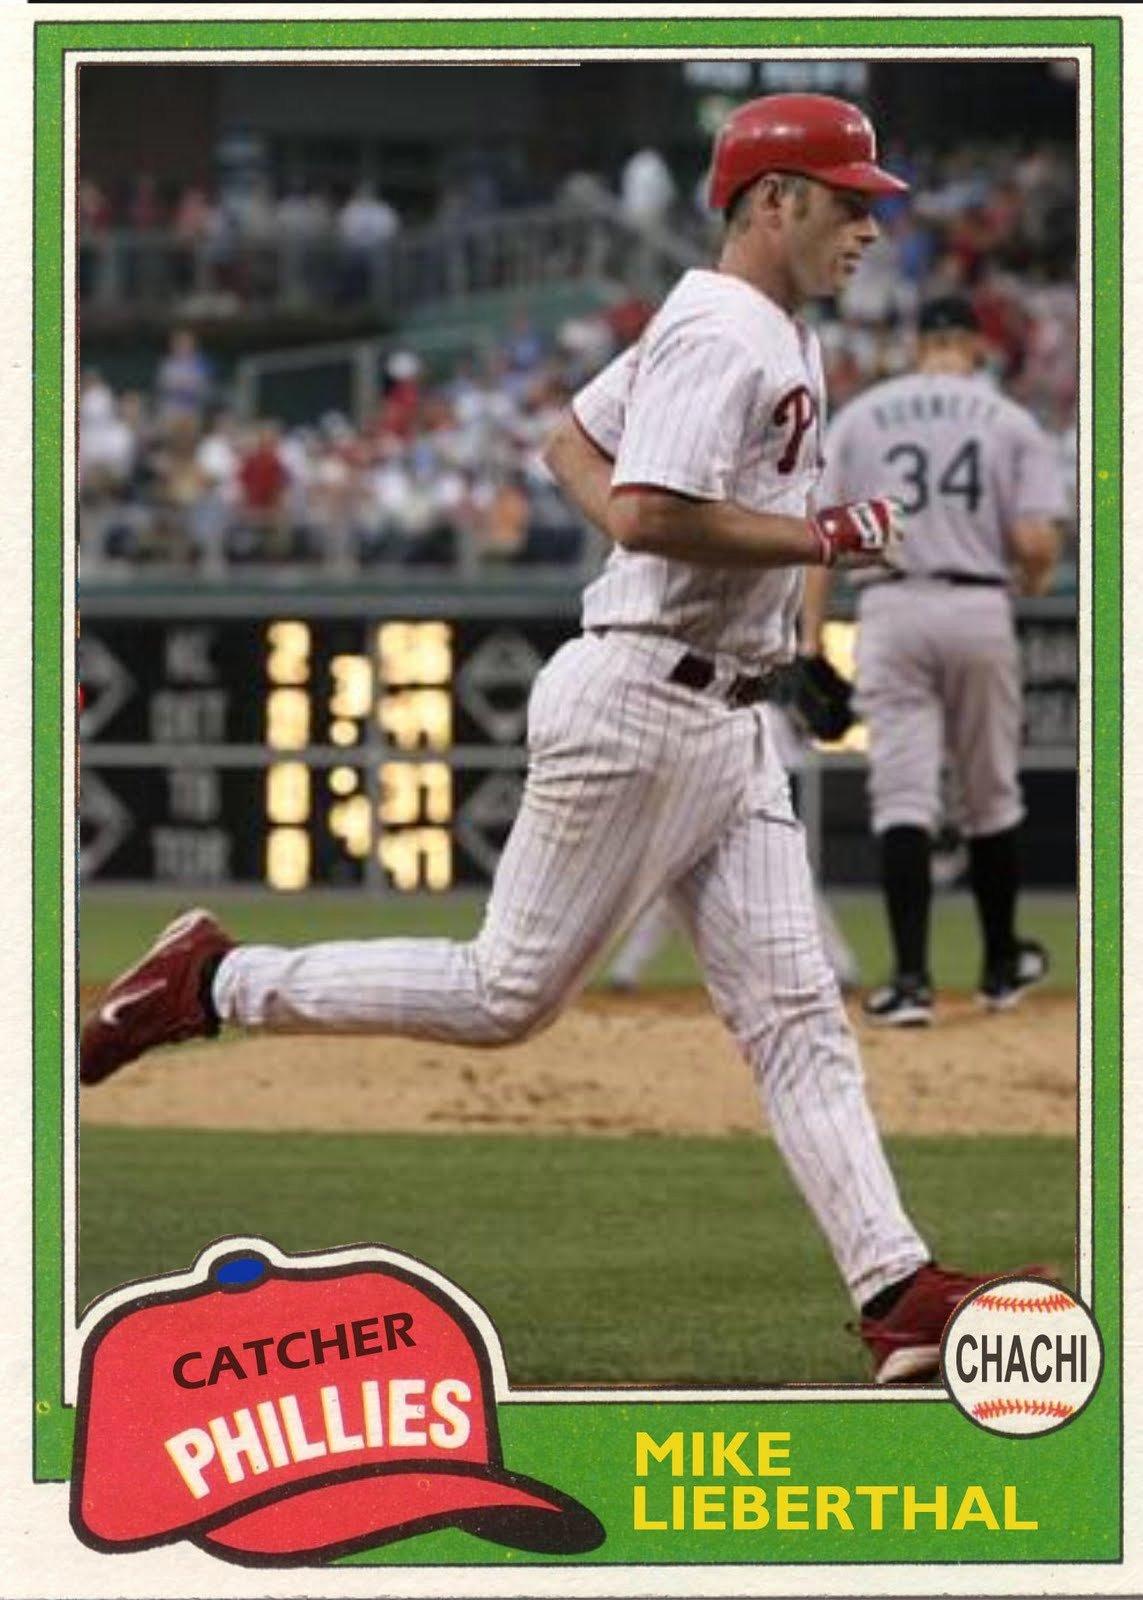 Baseball Card Size Template Fresh the Phillies Room How to Make A Baseball Card